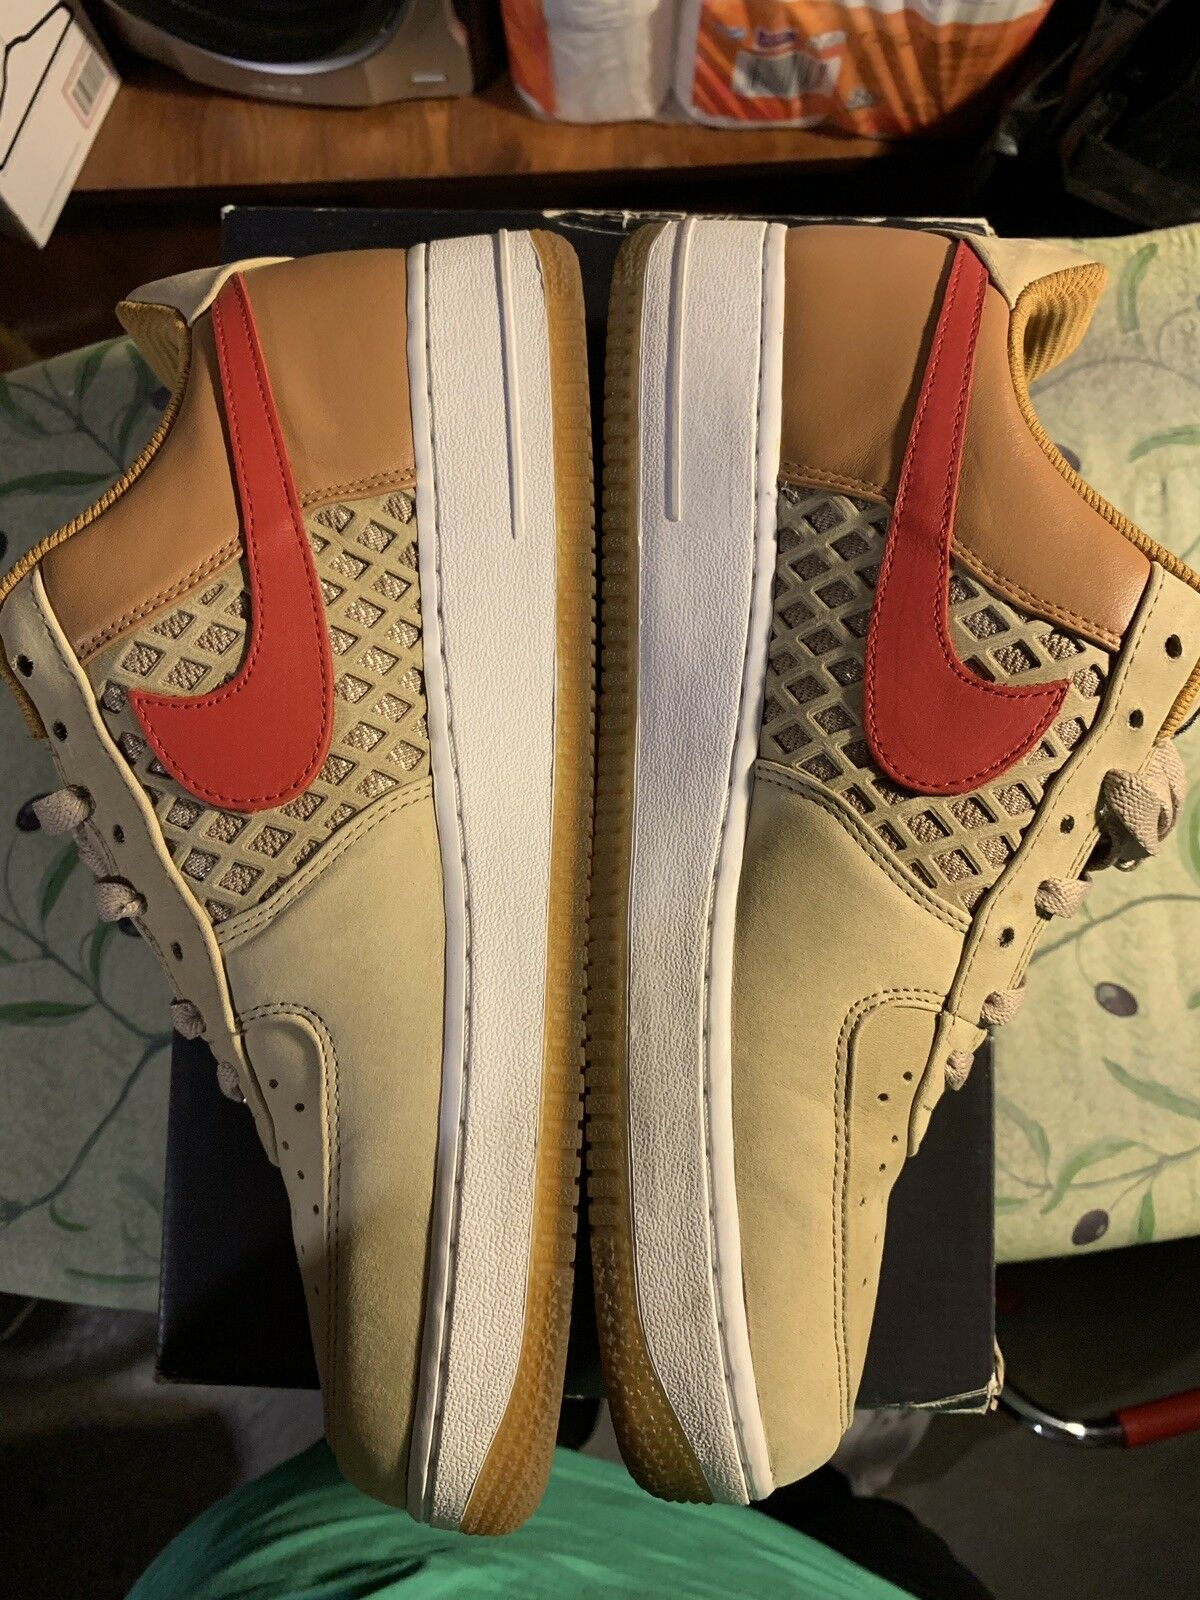 Mens Nike Air Force 1 Premium 2008 Beijing Tweed shoes size 10.5 US 318775-241